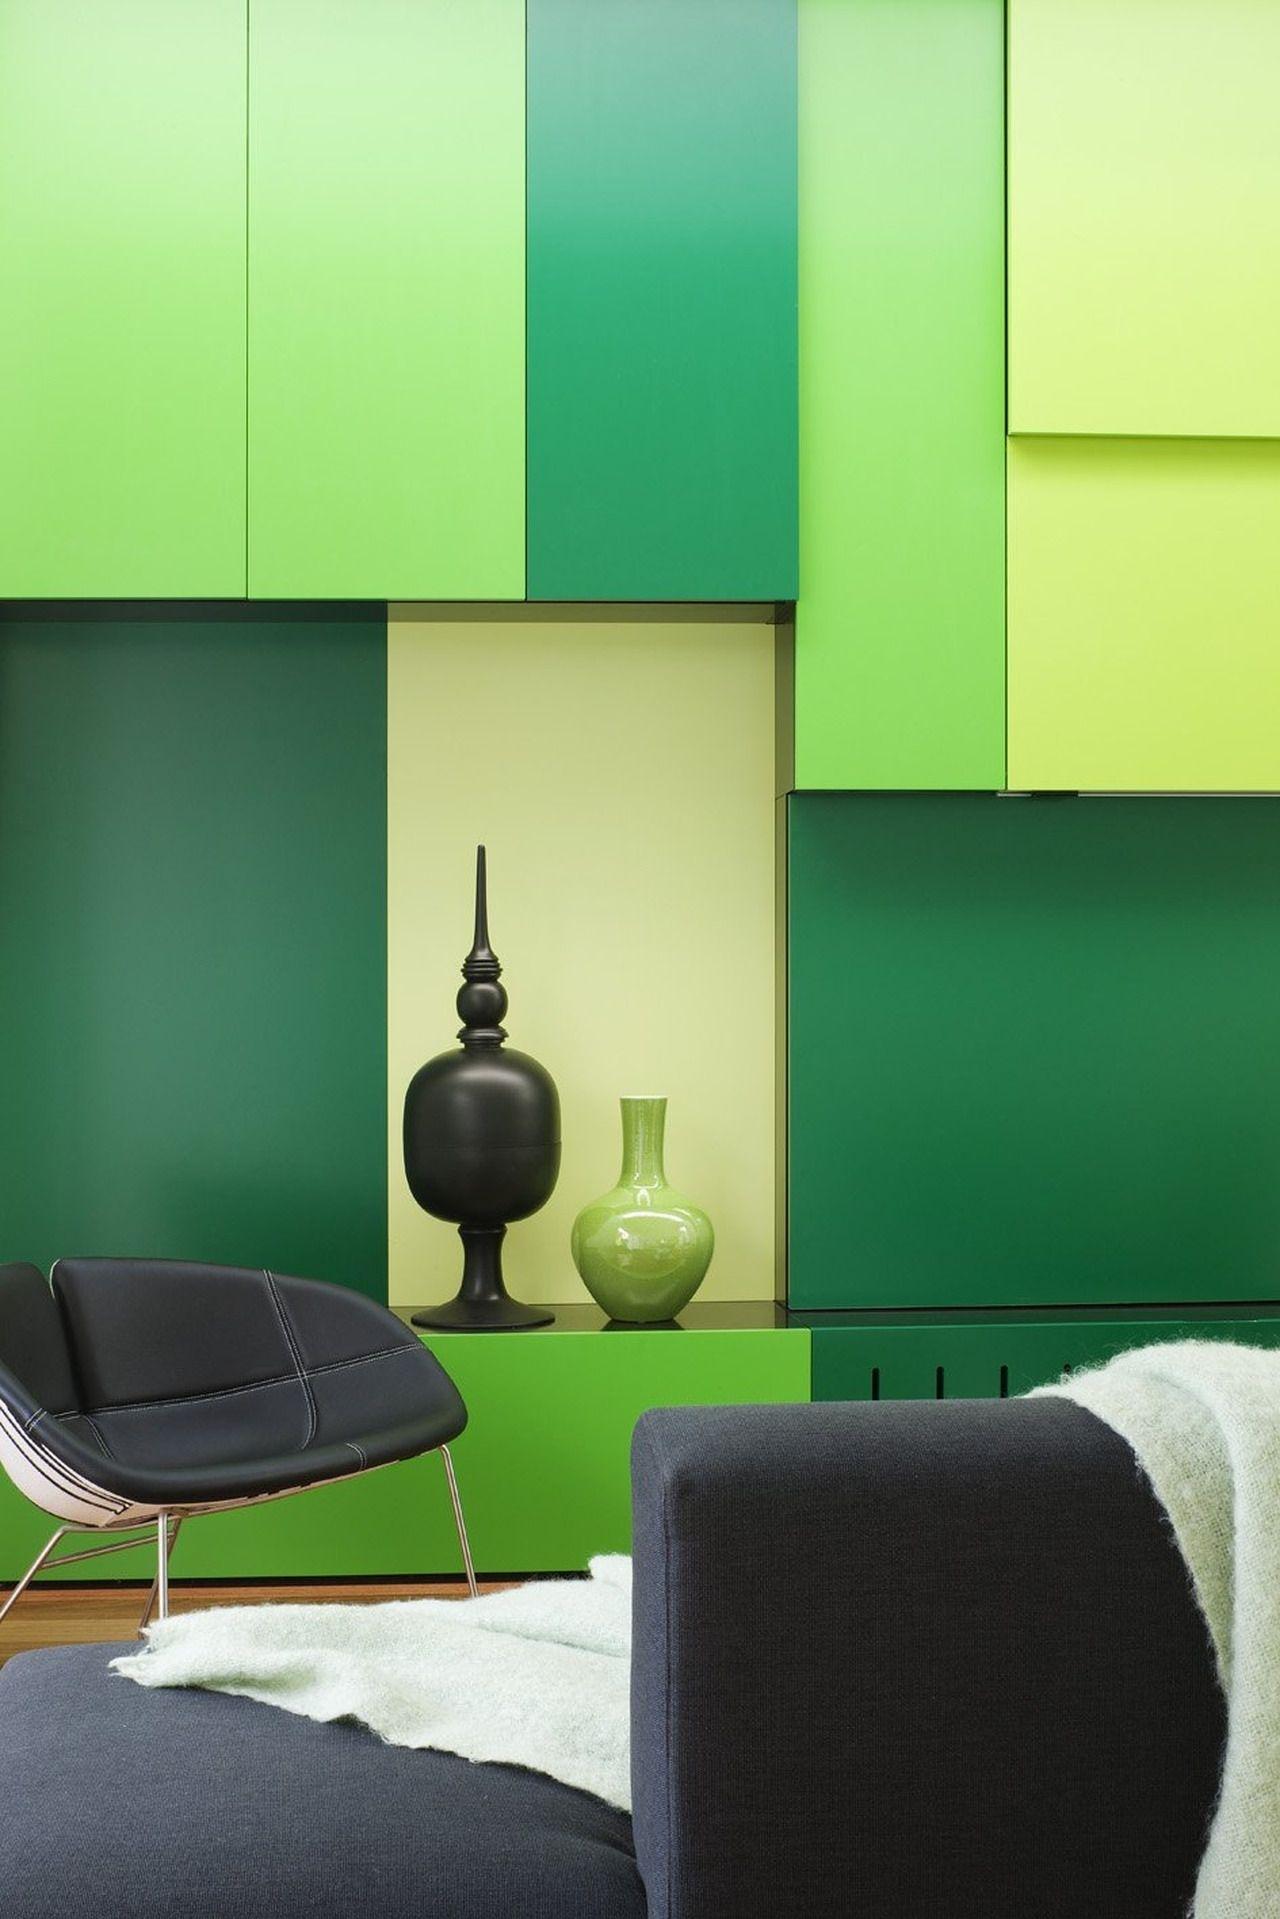 Home interior design color schemes shakin stevens house  interior design  pinterest  house and interiors